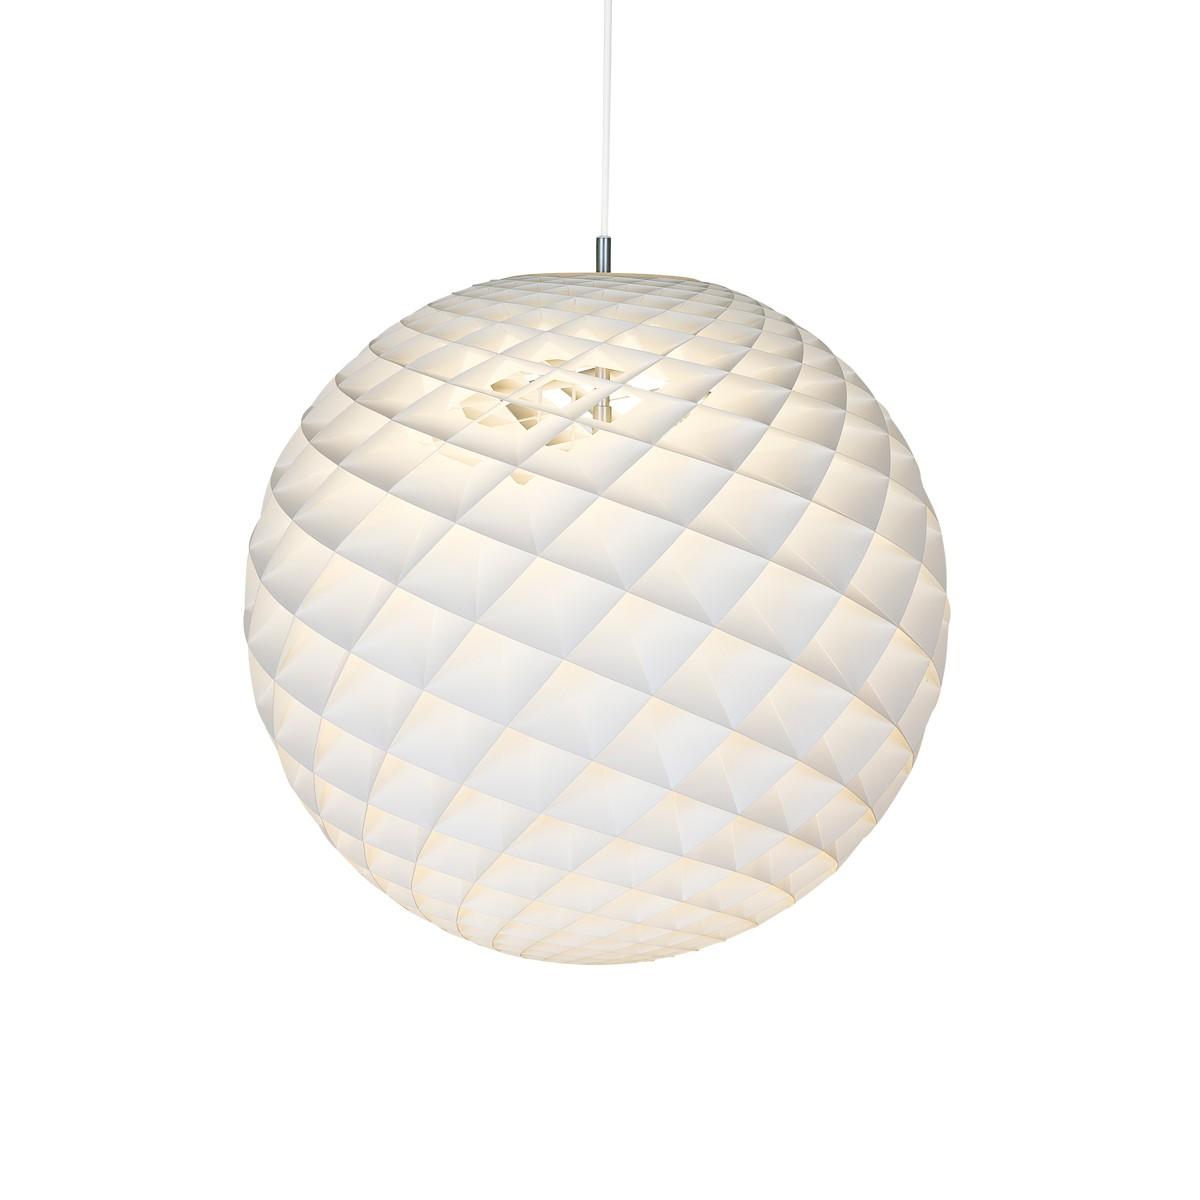 Louis Poulsen Patera LED Pendelleuchte, Ø: 45 cm, 2700 K, weiß matt